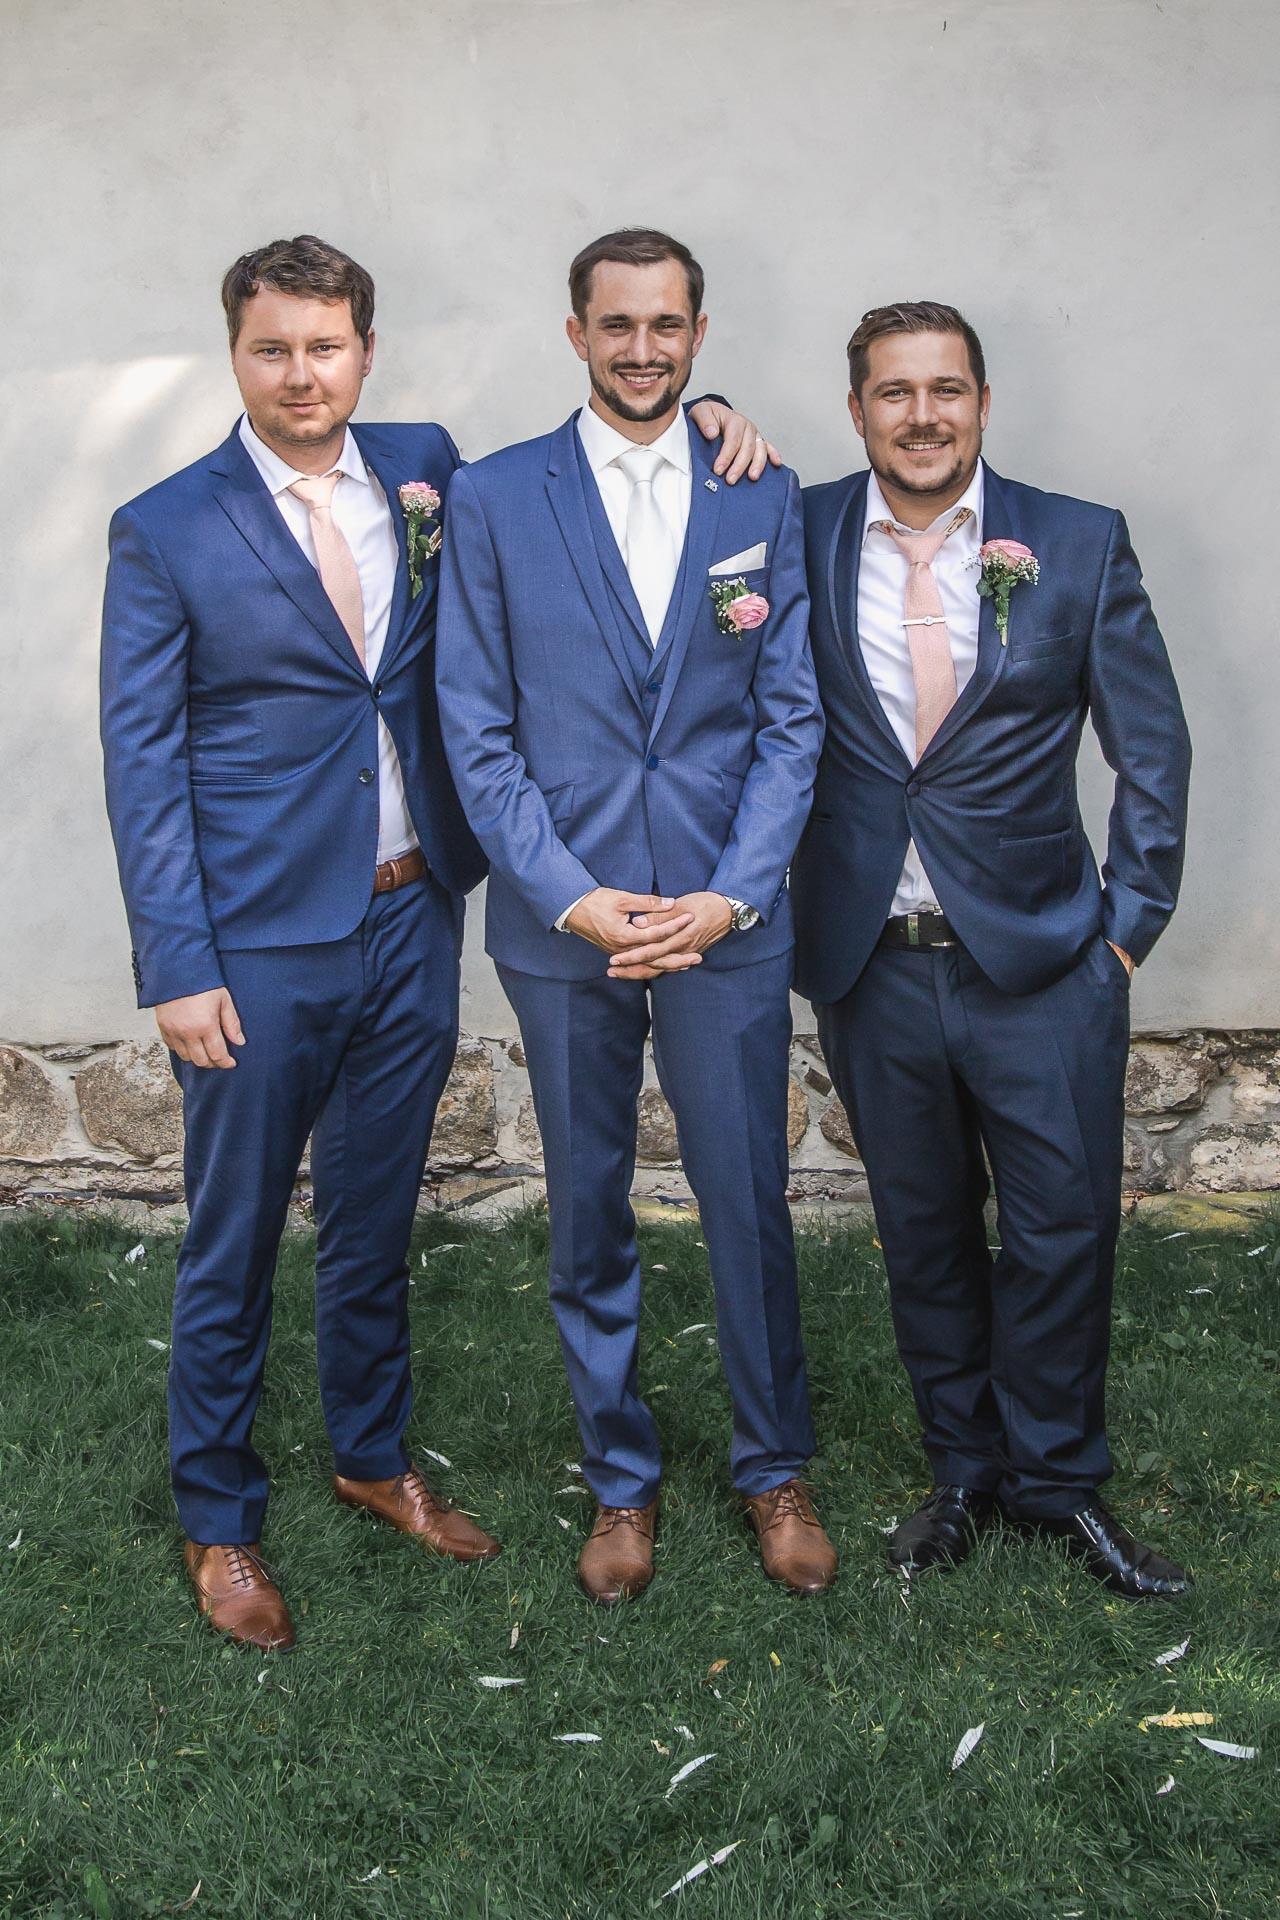 svatební-fotograf-wedding-svatebni-video-orlík-vltava-kostel-statek-stodola-boho-svatba-Beautyfoto-408